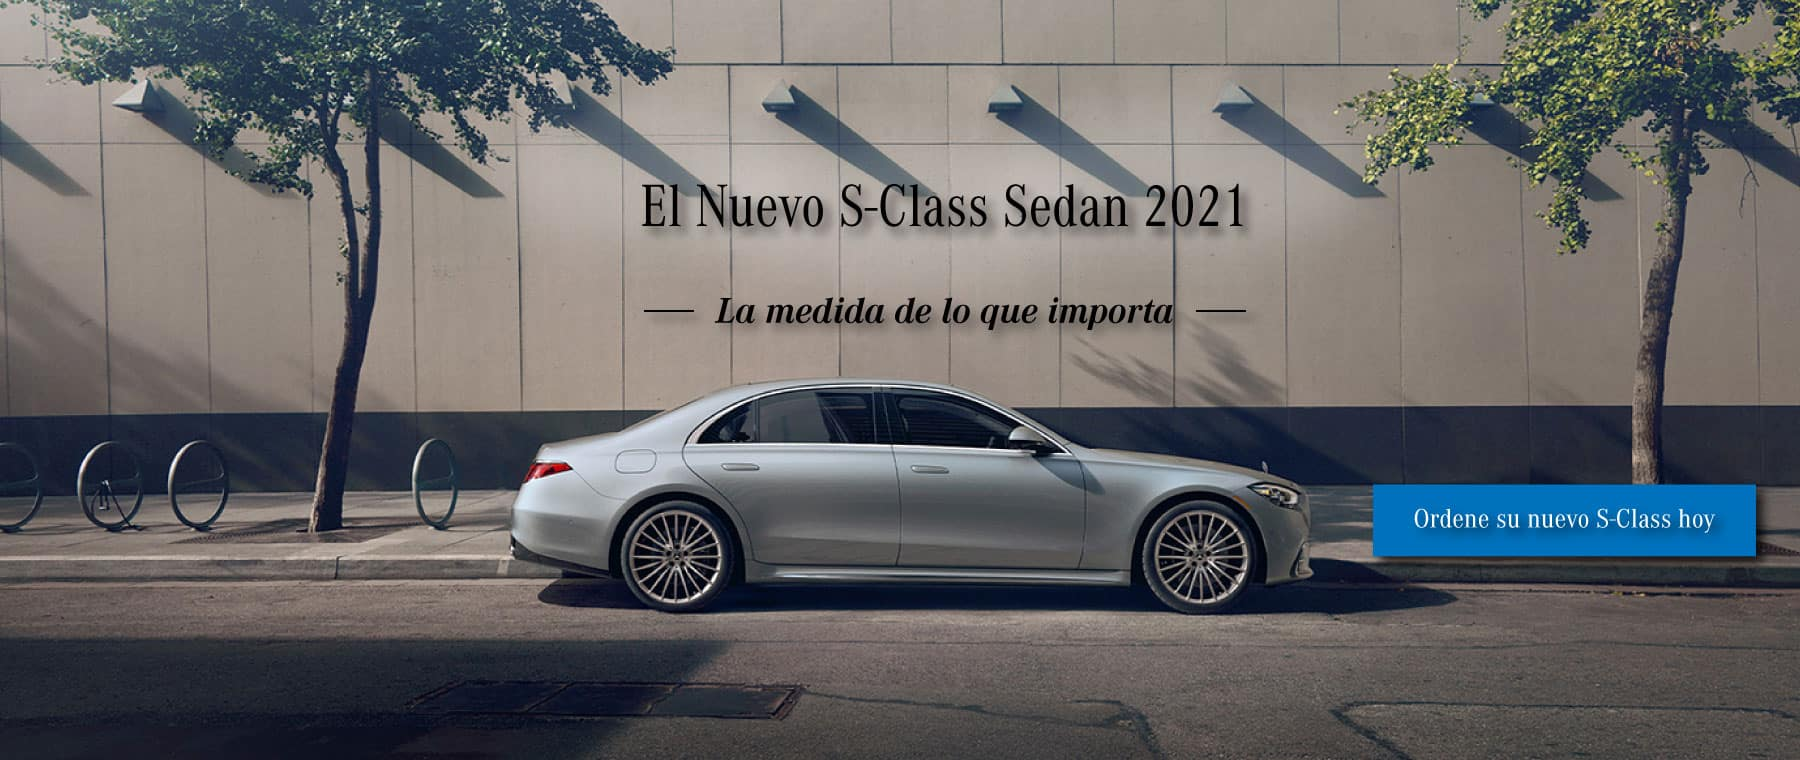 Garage Isla Verde 2021 Mercedes-Benz S-Class Sedan